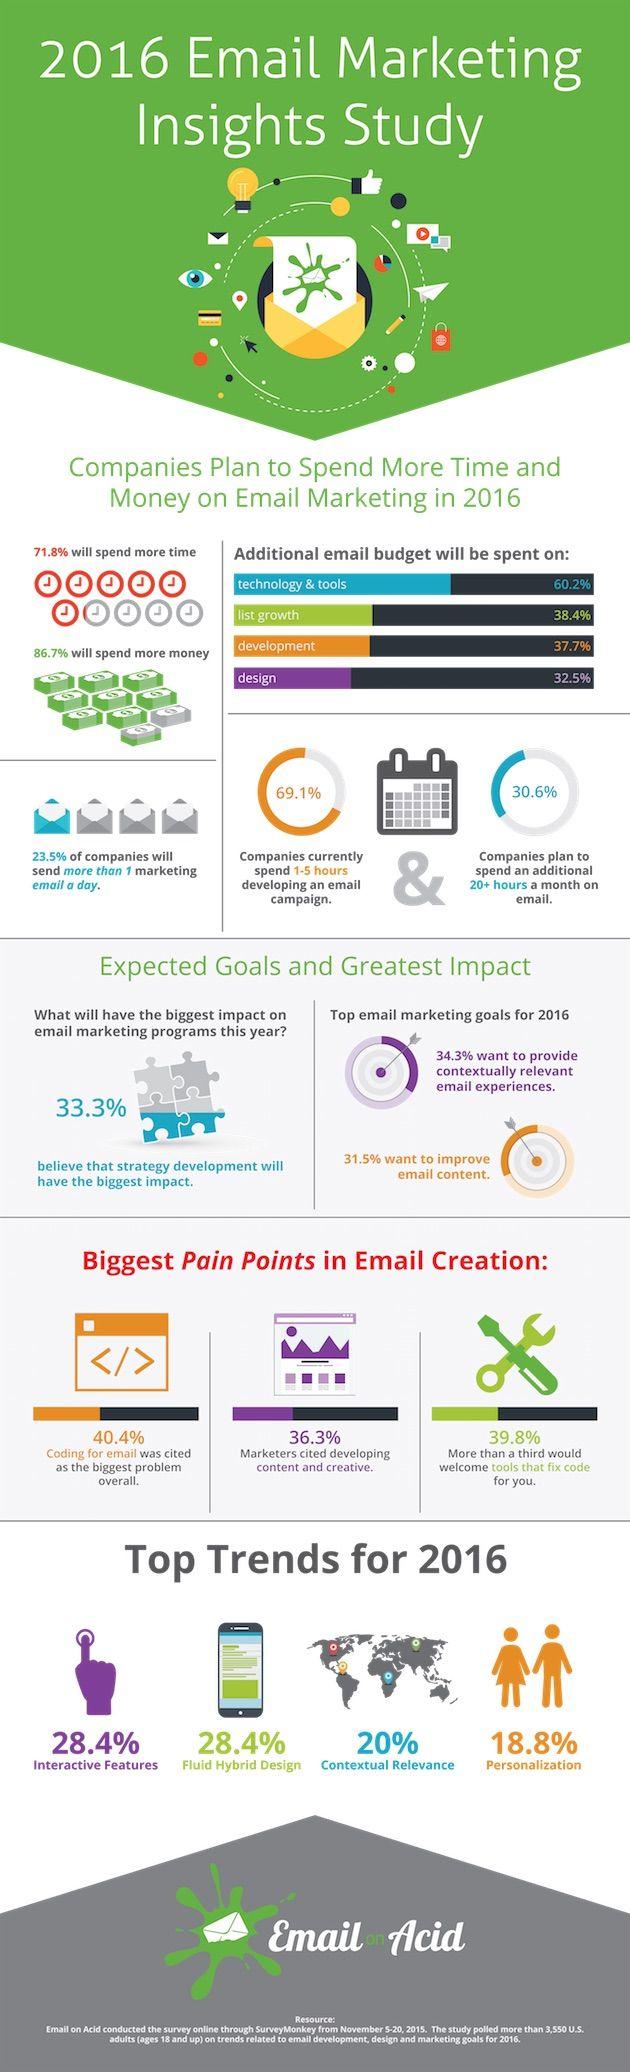 Best EMail Marketing Images On   Digital Marketing